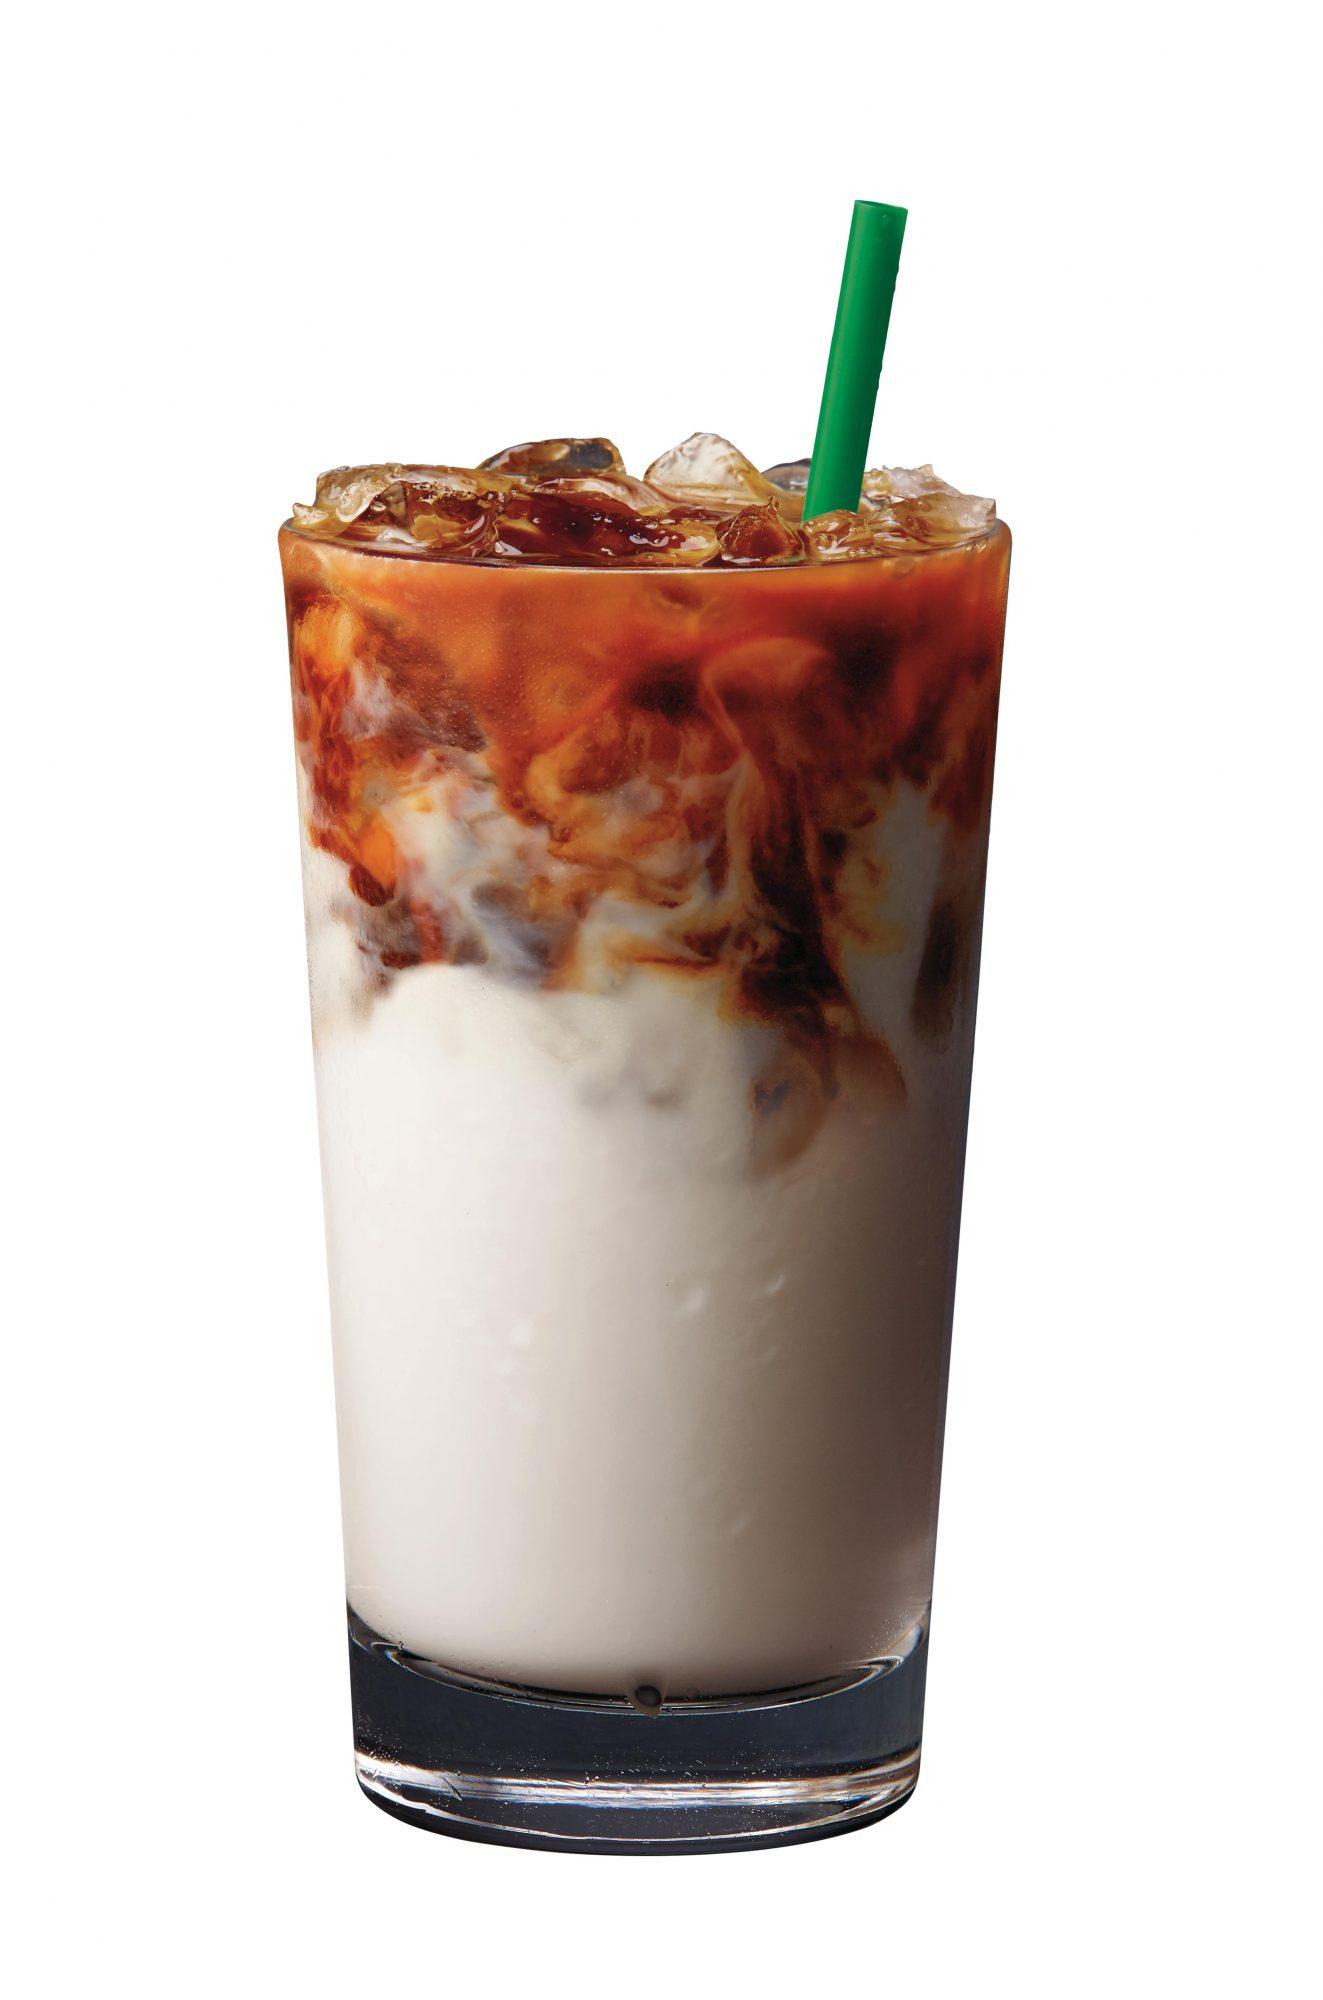 Iced-Almond-Milk-Latte-Macchiato.jpg